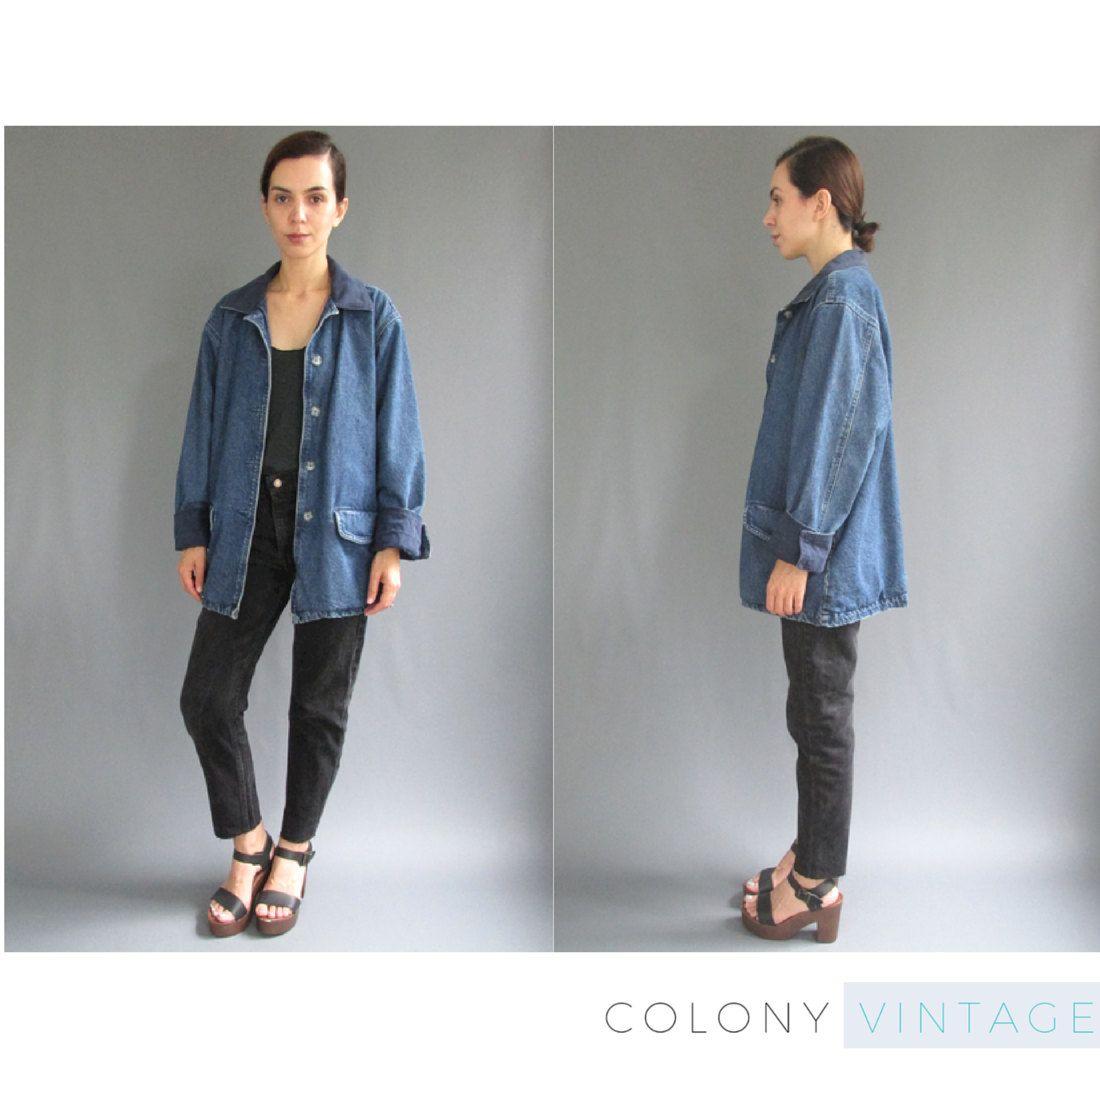 barns coats vintage sale crew womens shop j dot outerwear barn jacket boswell jackets garmentory